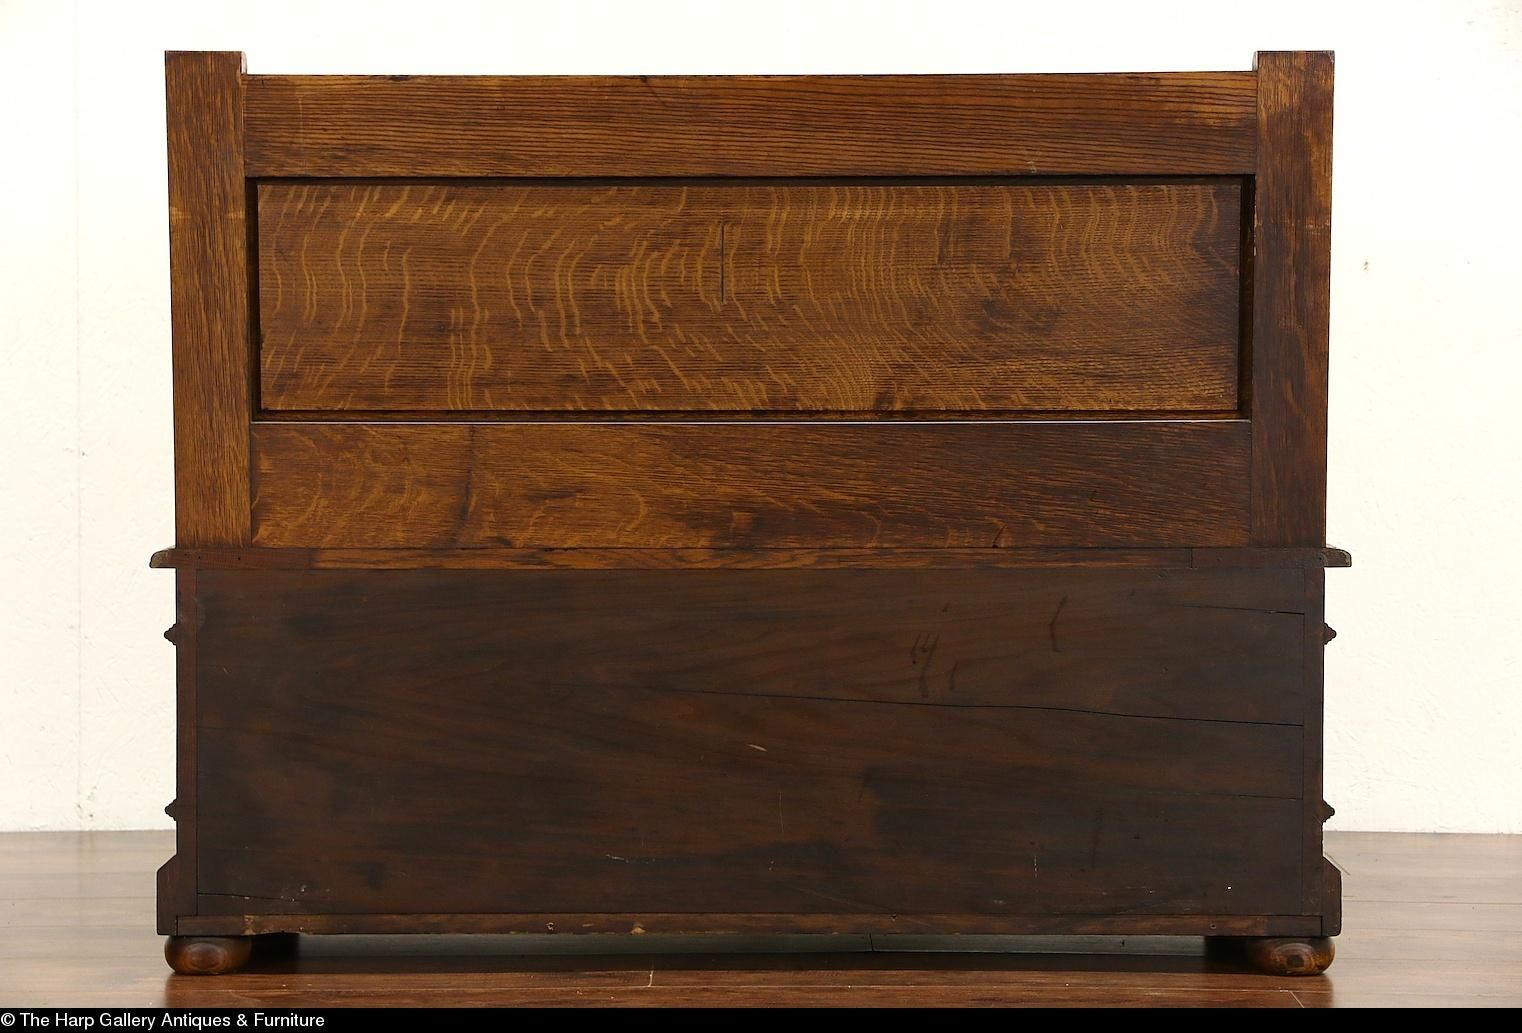 Enjoyable Carved Oak 1890S Antique Hall Bench Lift Seat Storage Spiritservingveterans Wood Chair Design Ideas Spiritservingveteransorg